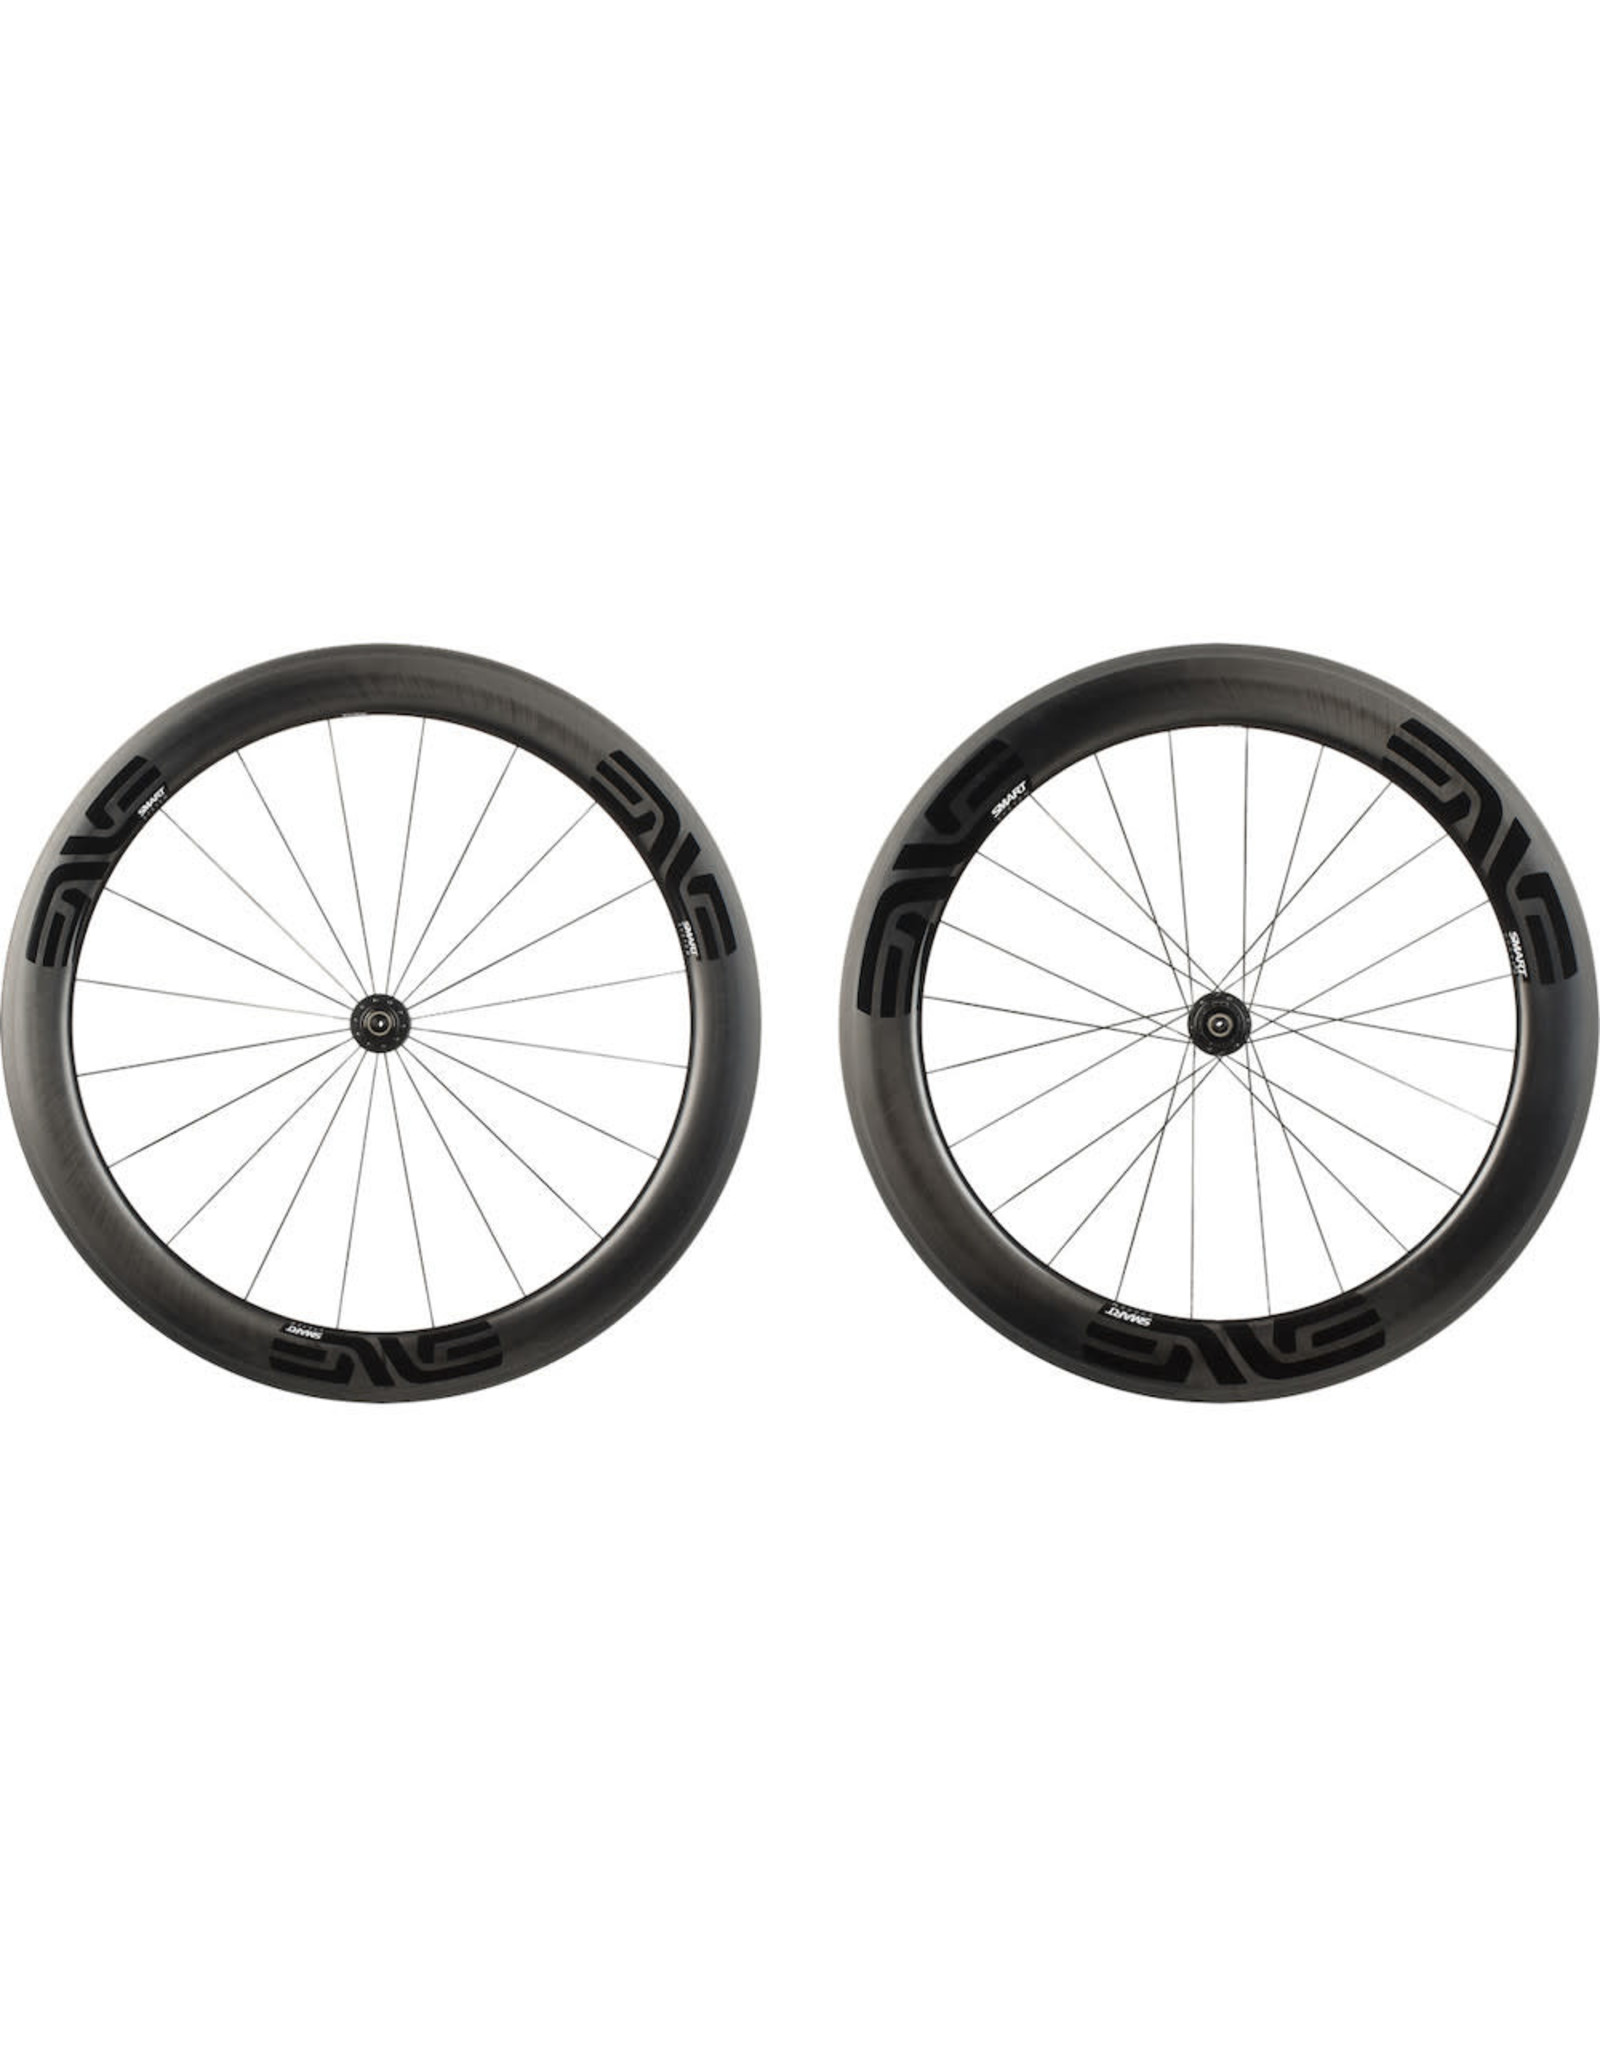 ENVE Composites ENVE SES 6.7 Tubular Wheelset - DT Swiss 240 (Shimano/SRAM)